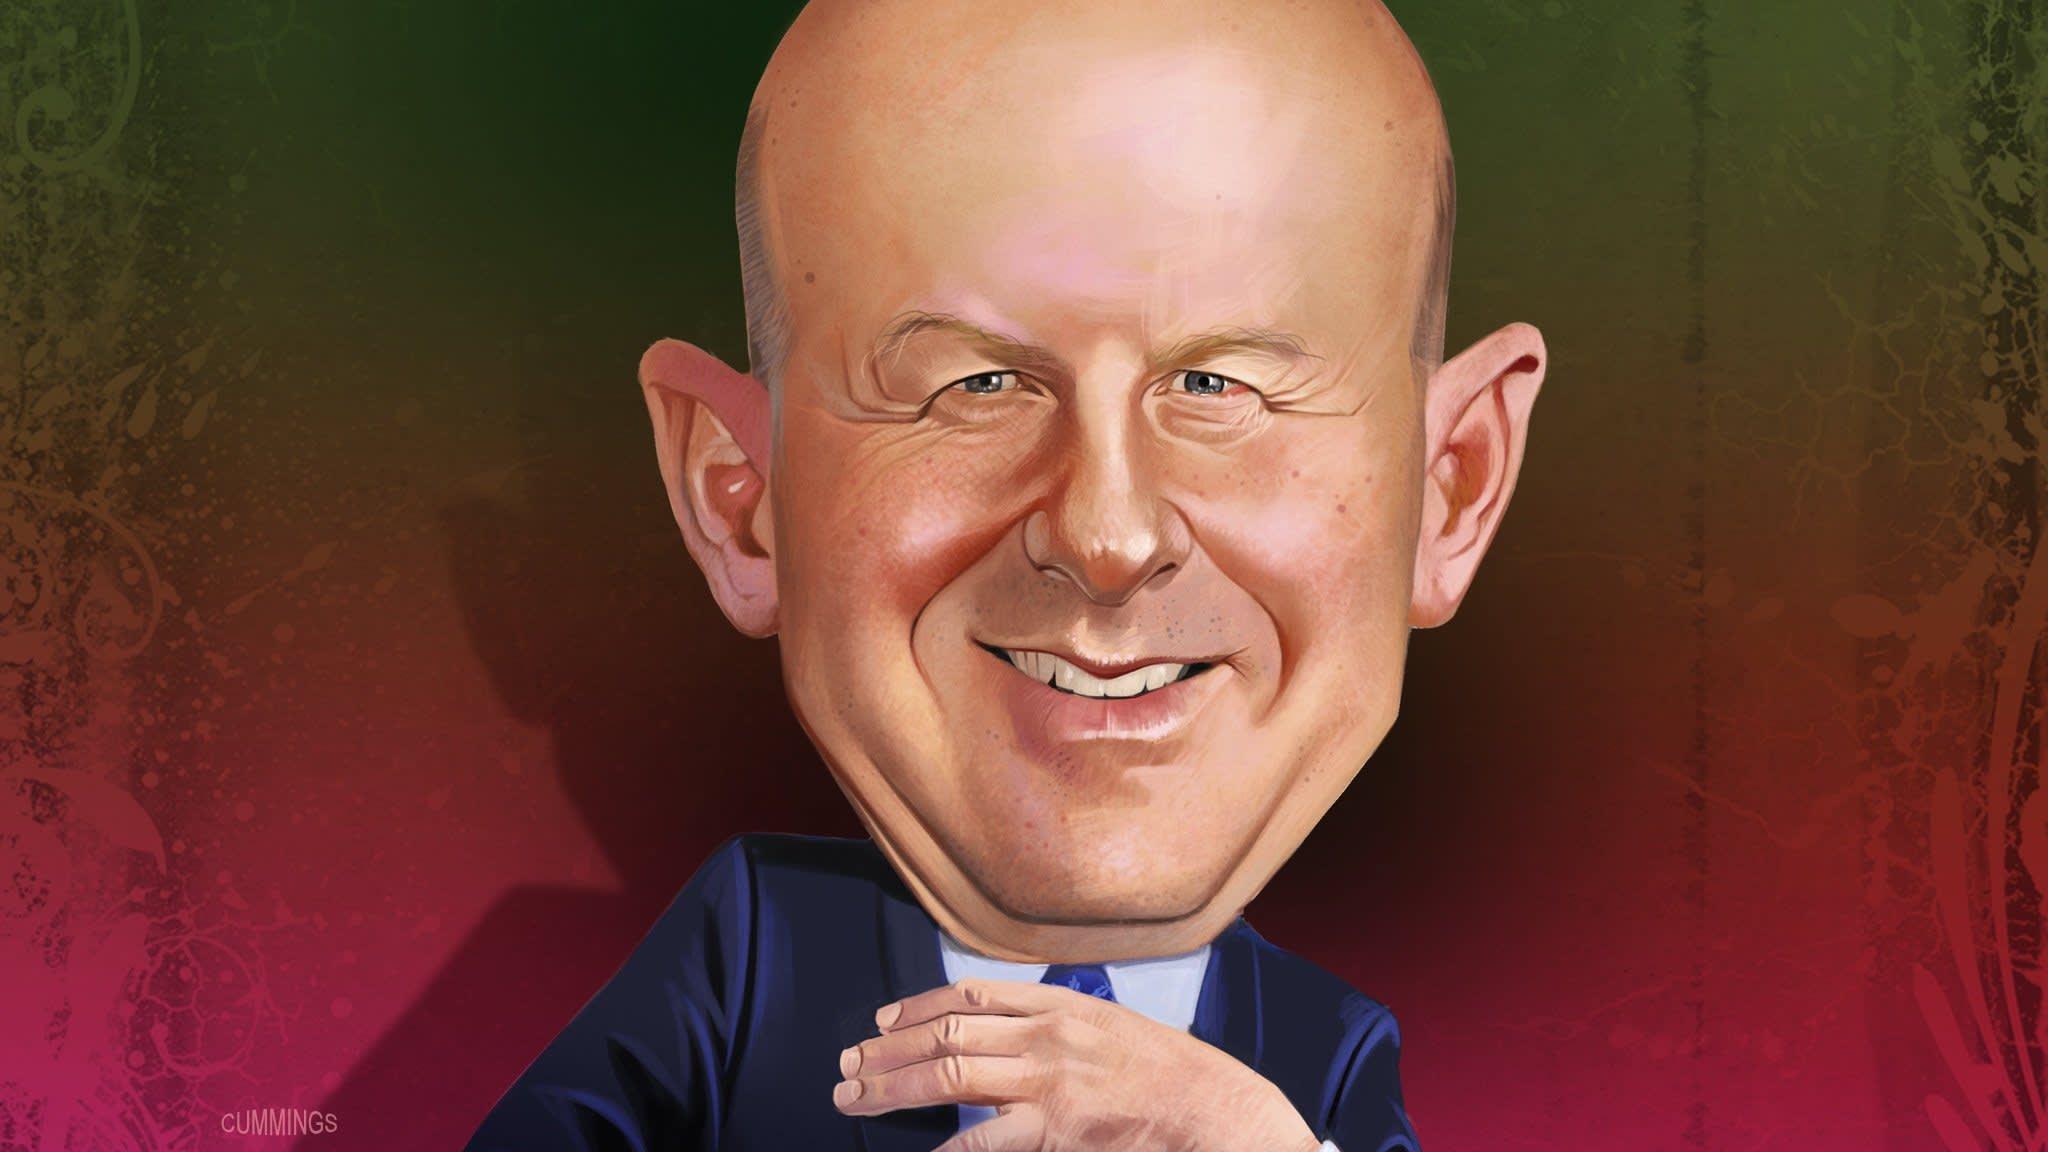 David Solomon, a smart operator prevails at Goldman Sachs